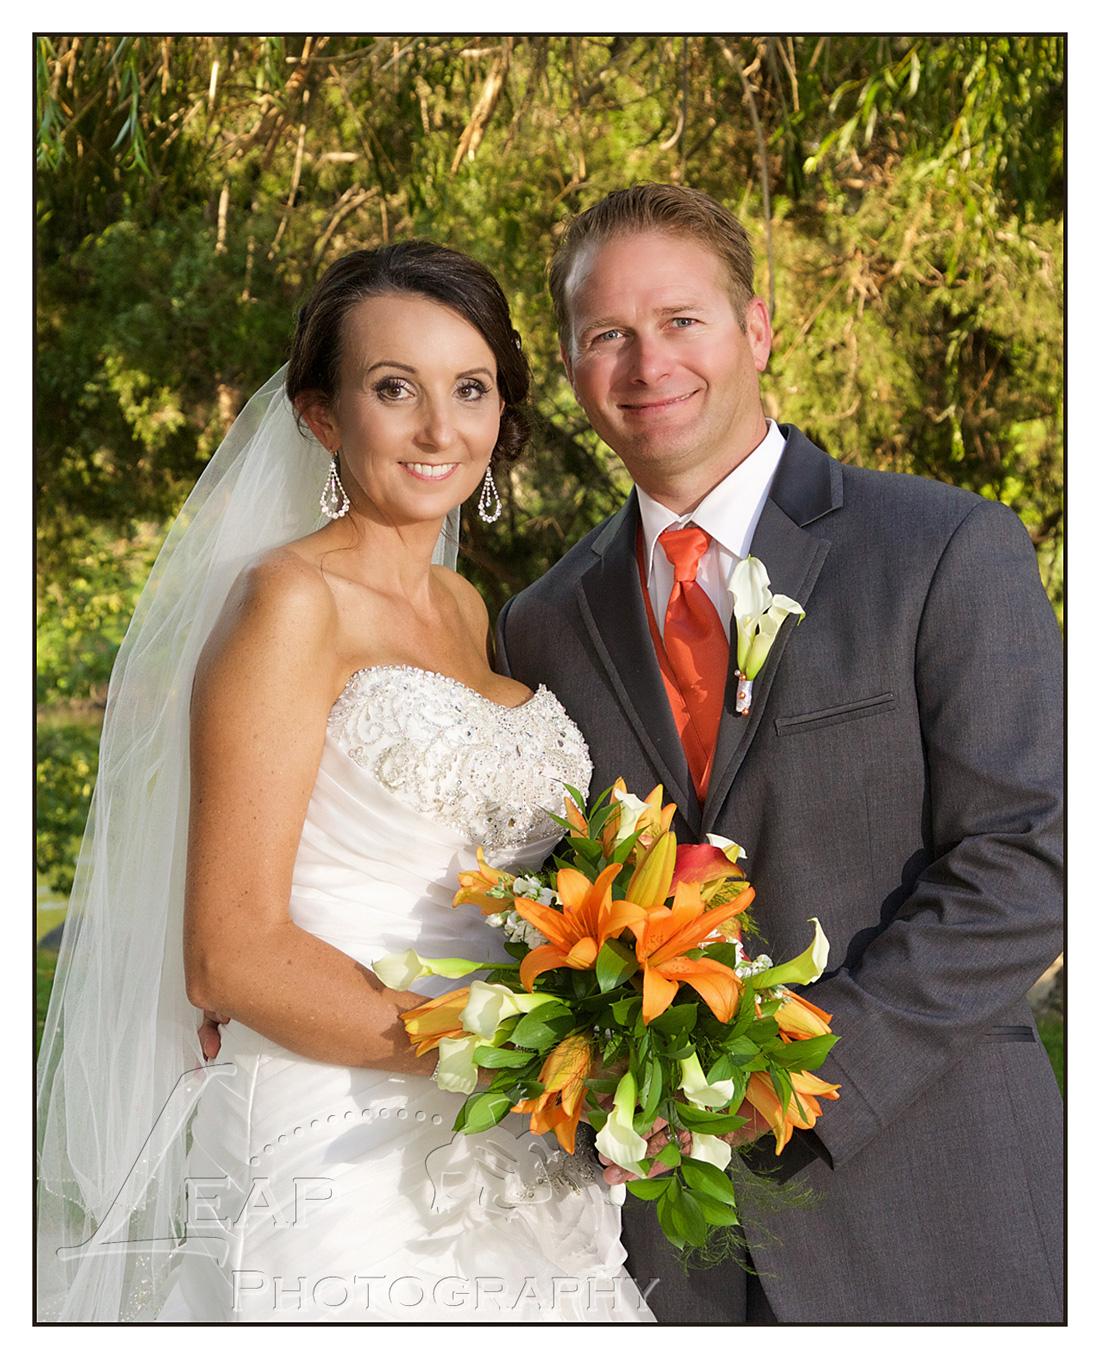 Boise couple on their wedding day